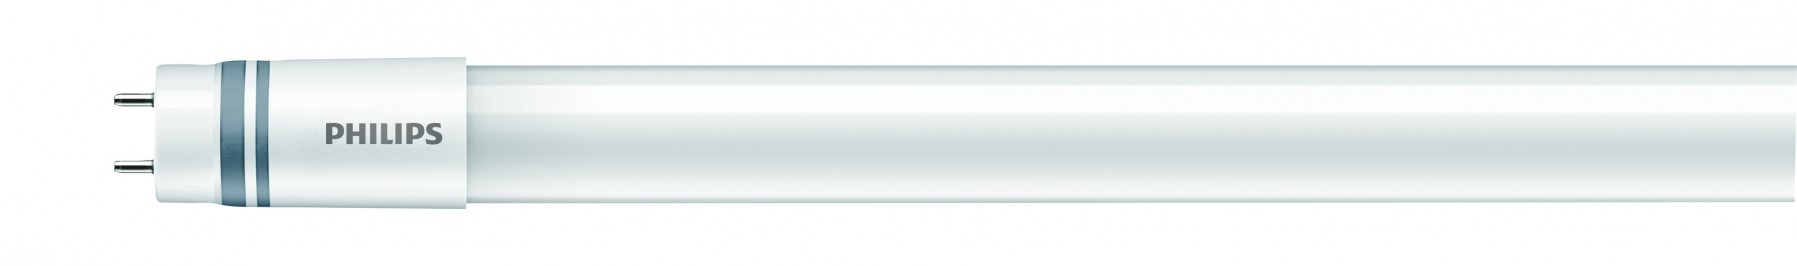 Philips CorePro LED tube 120 cm InstantFit Röhre für EVG 15 Watt Lichtfarbe wählbar